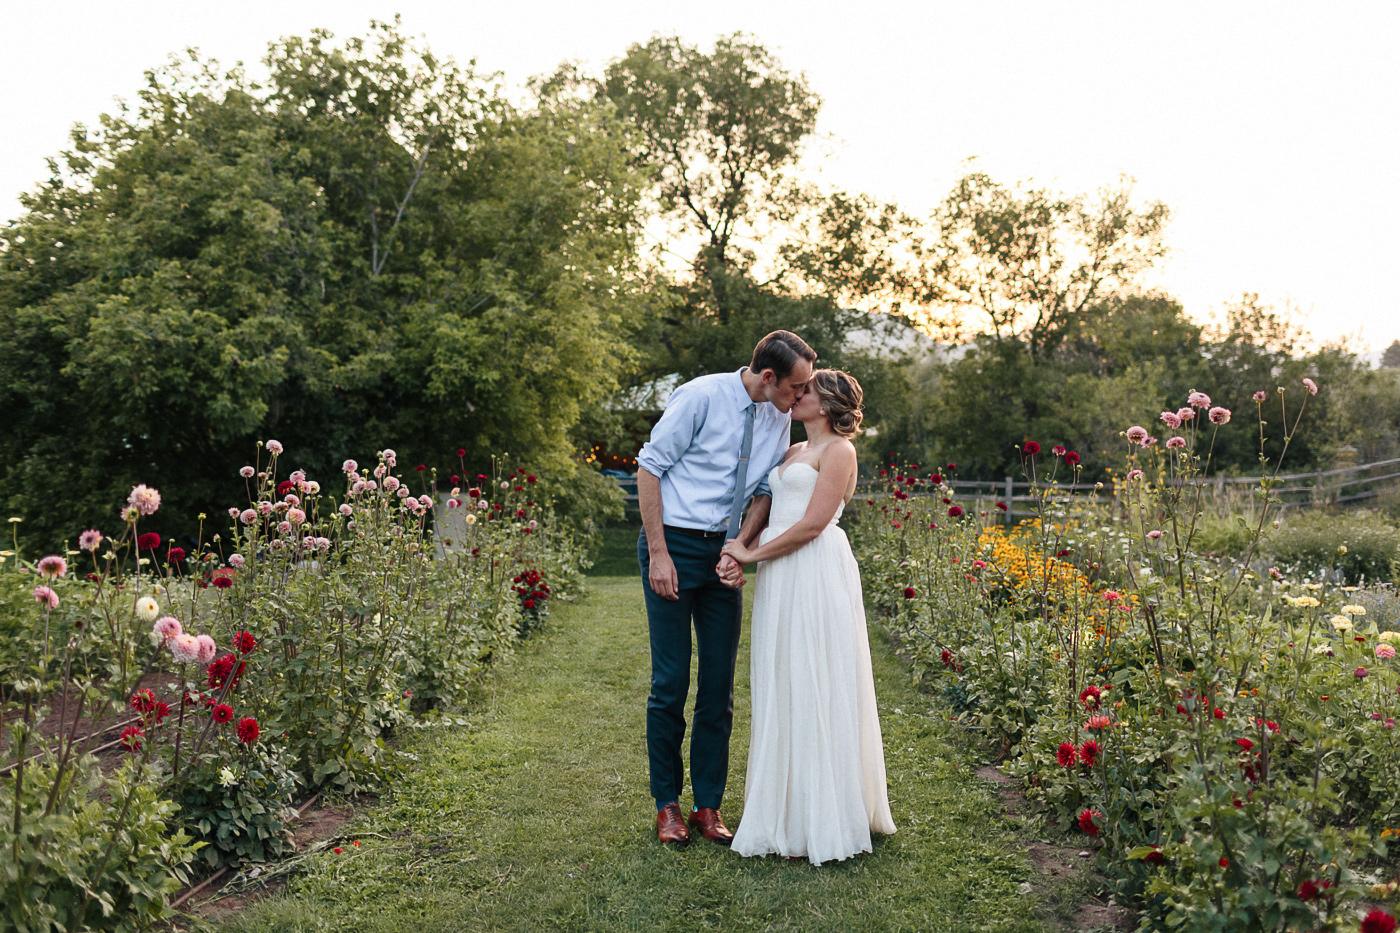 Lyons-Farmette-Wedding-Photographer-Lucy-Austin-Flash-Mob-Dance-68.jpg